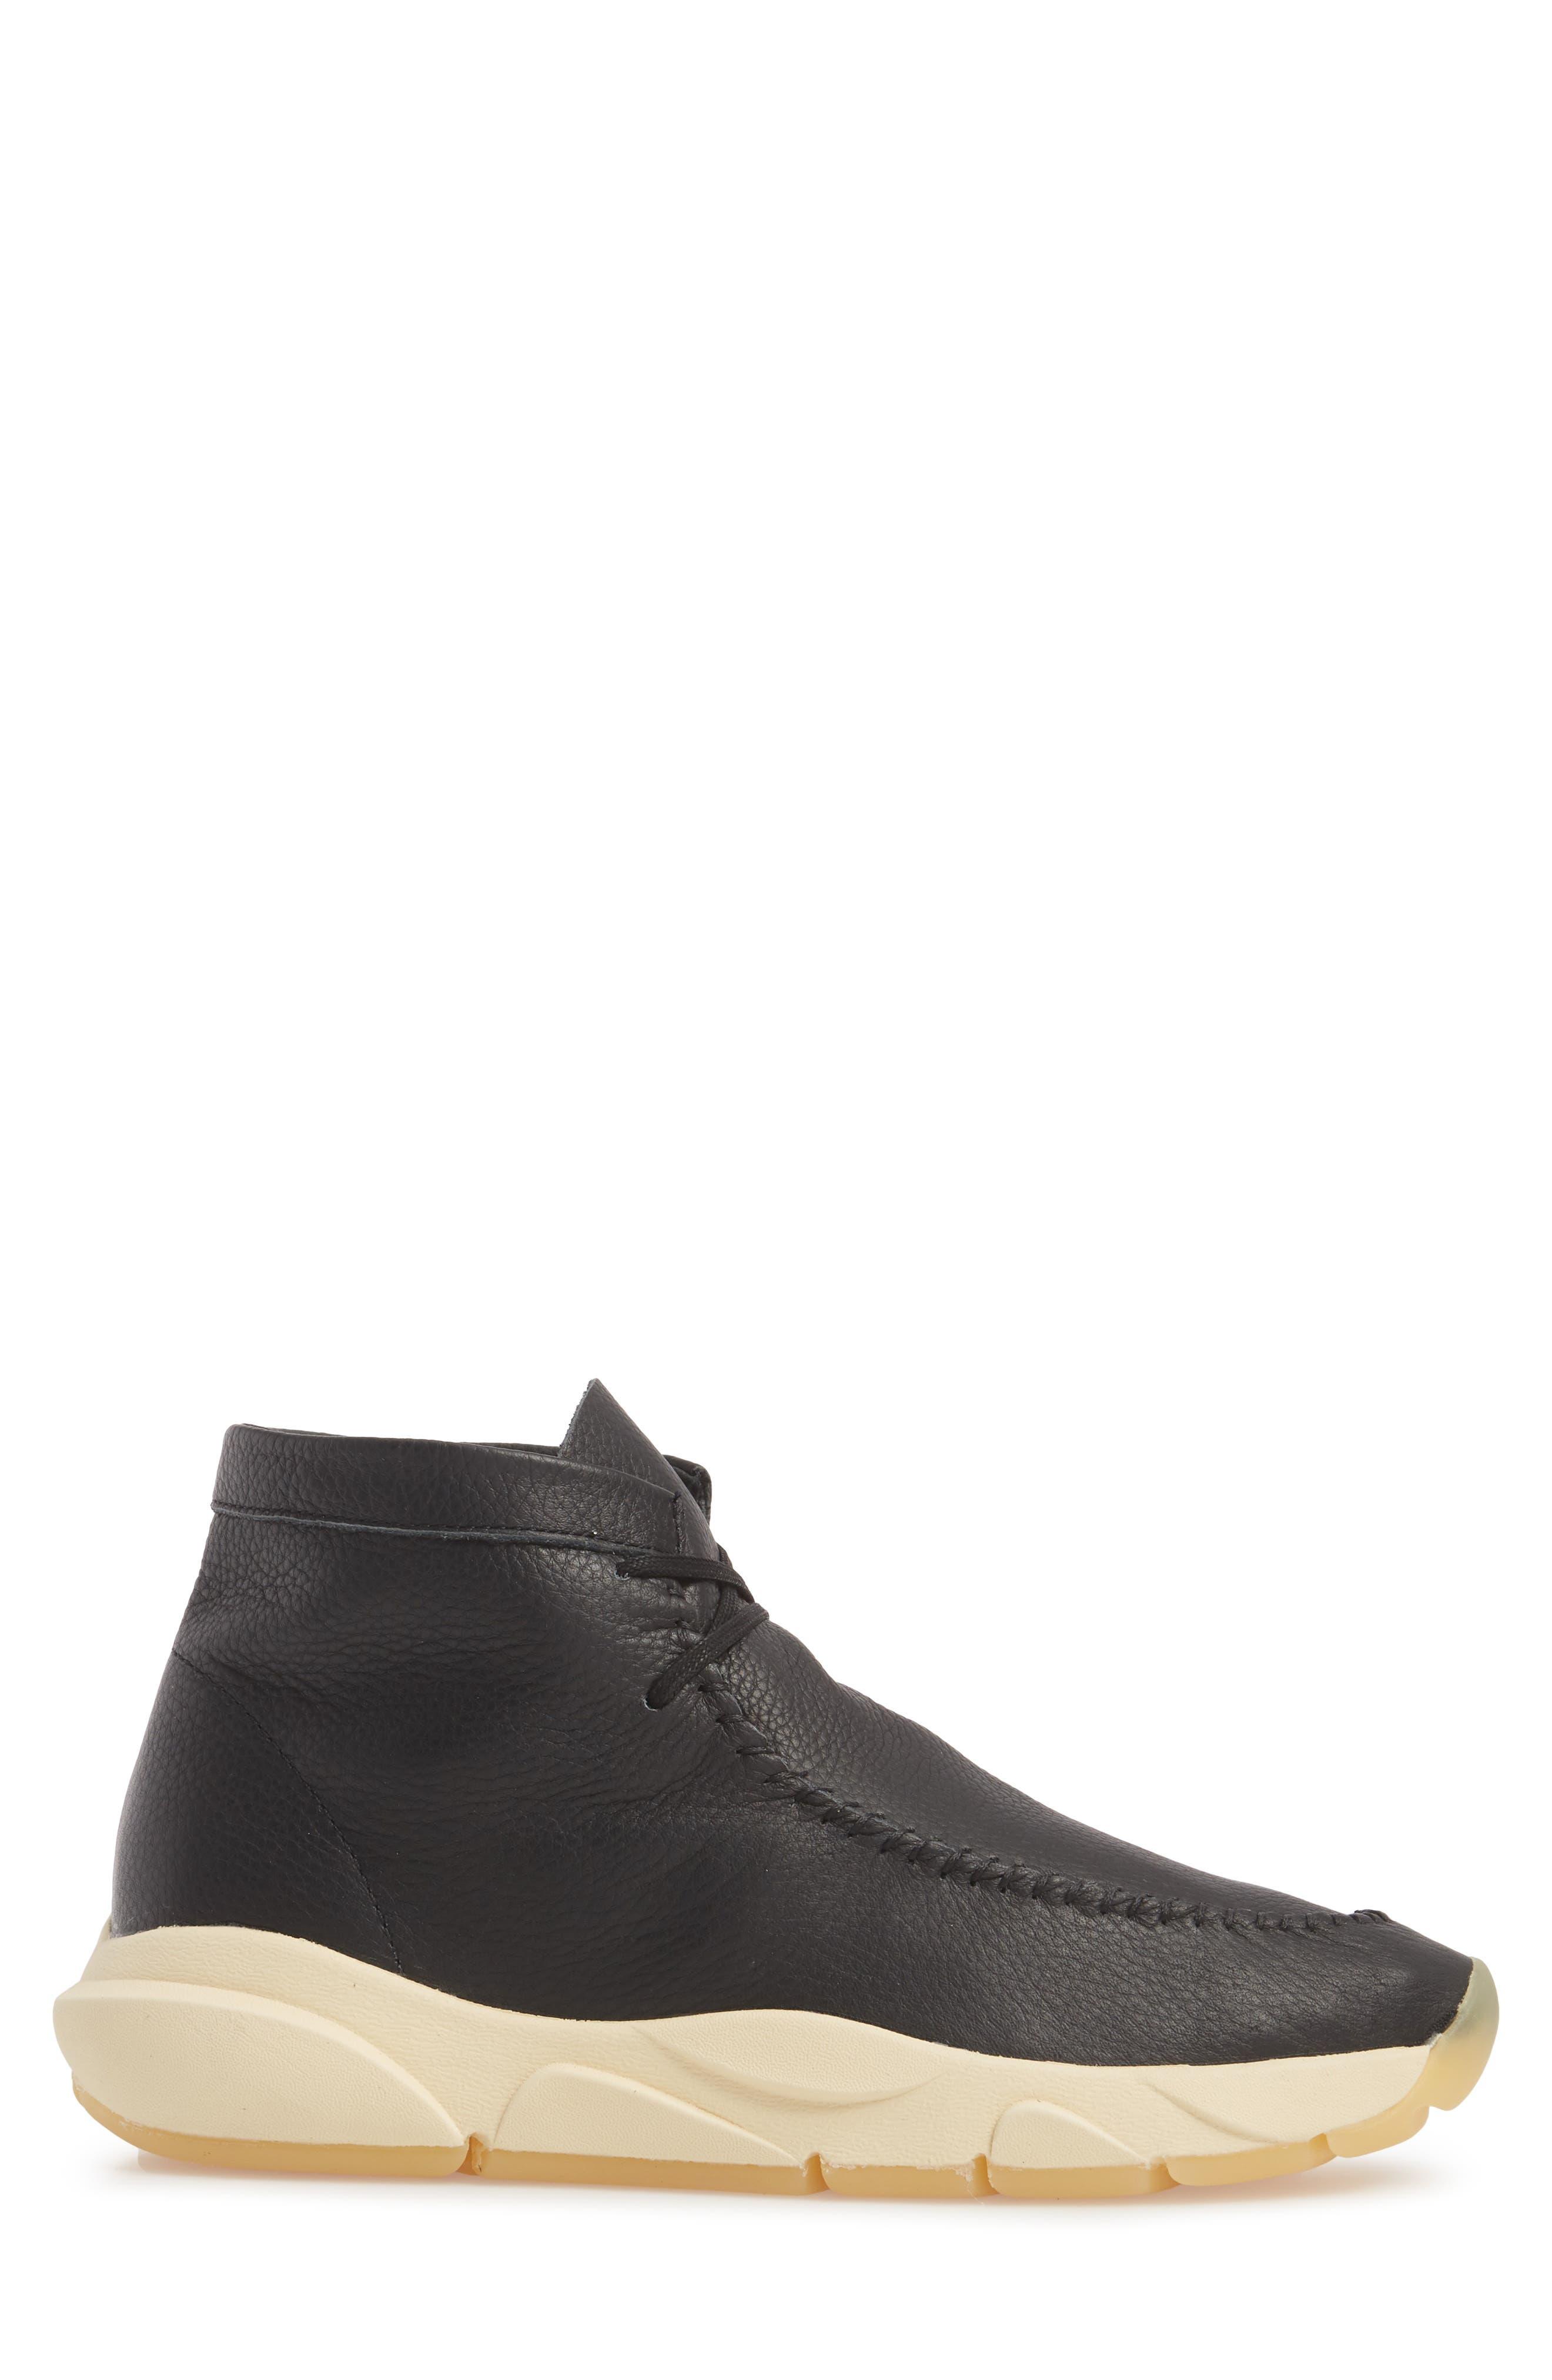 Alternate Image 3  - Clearweather Castas Asymmetrical Chukka Sneaker (Men)